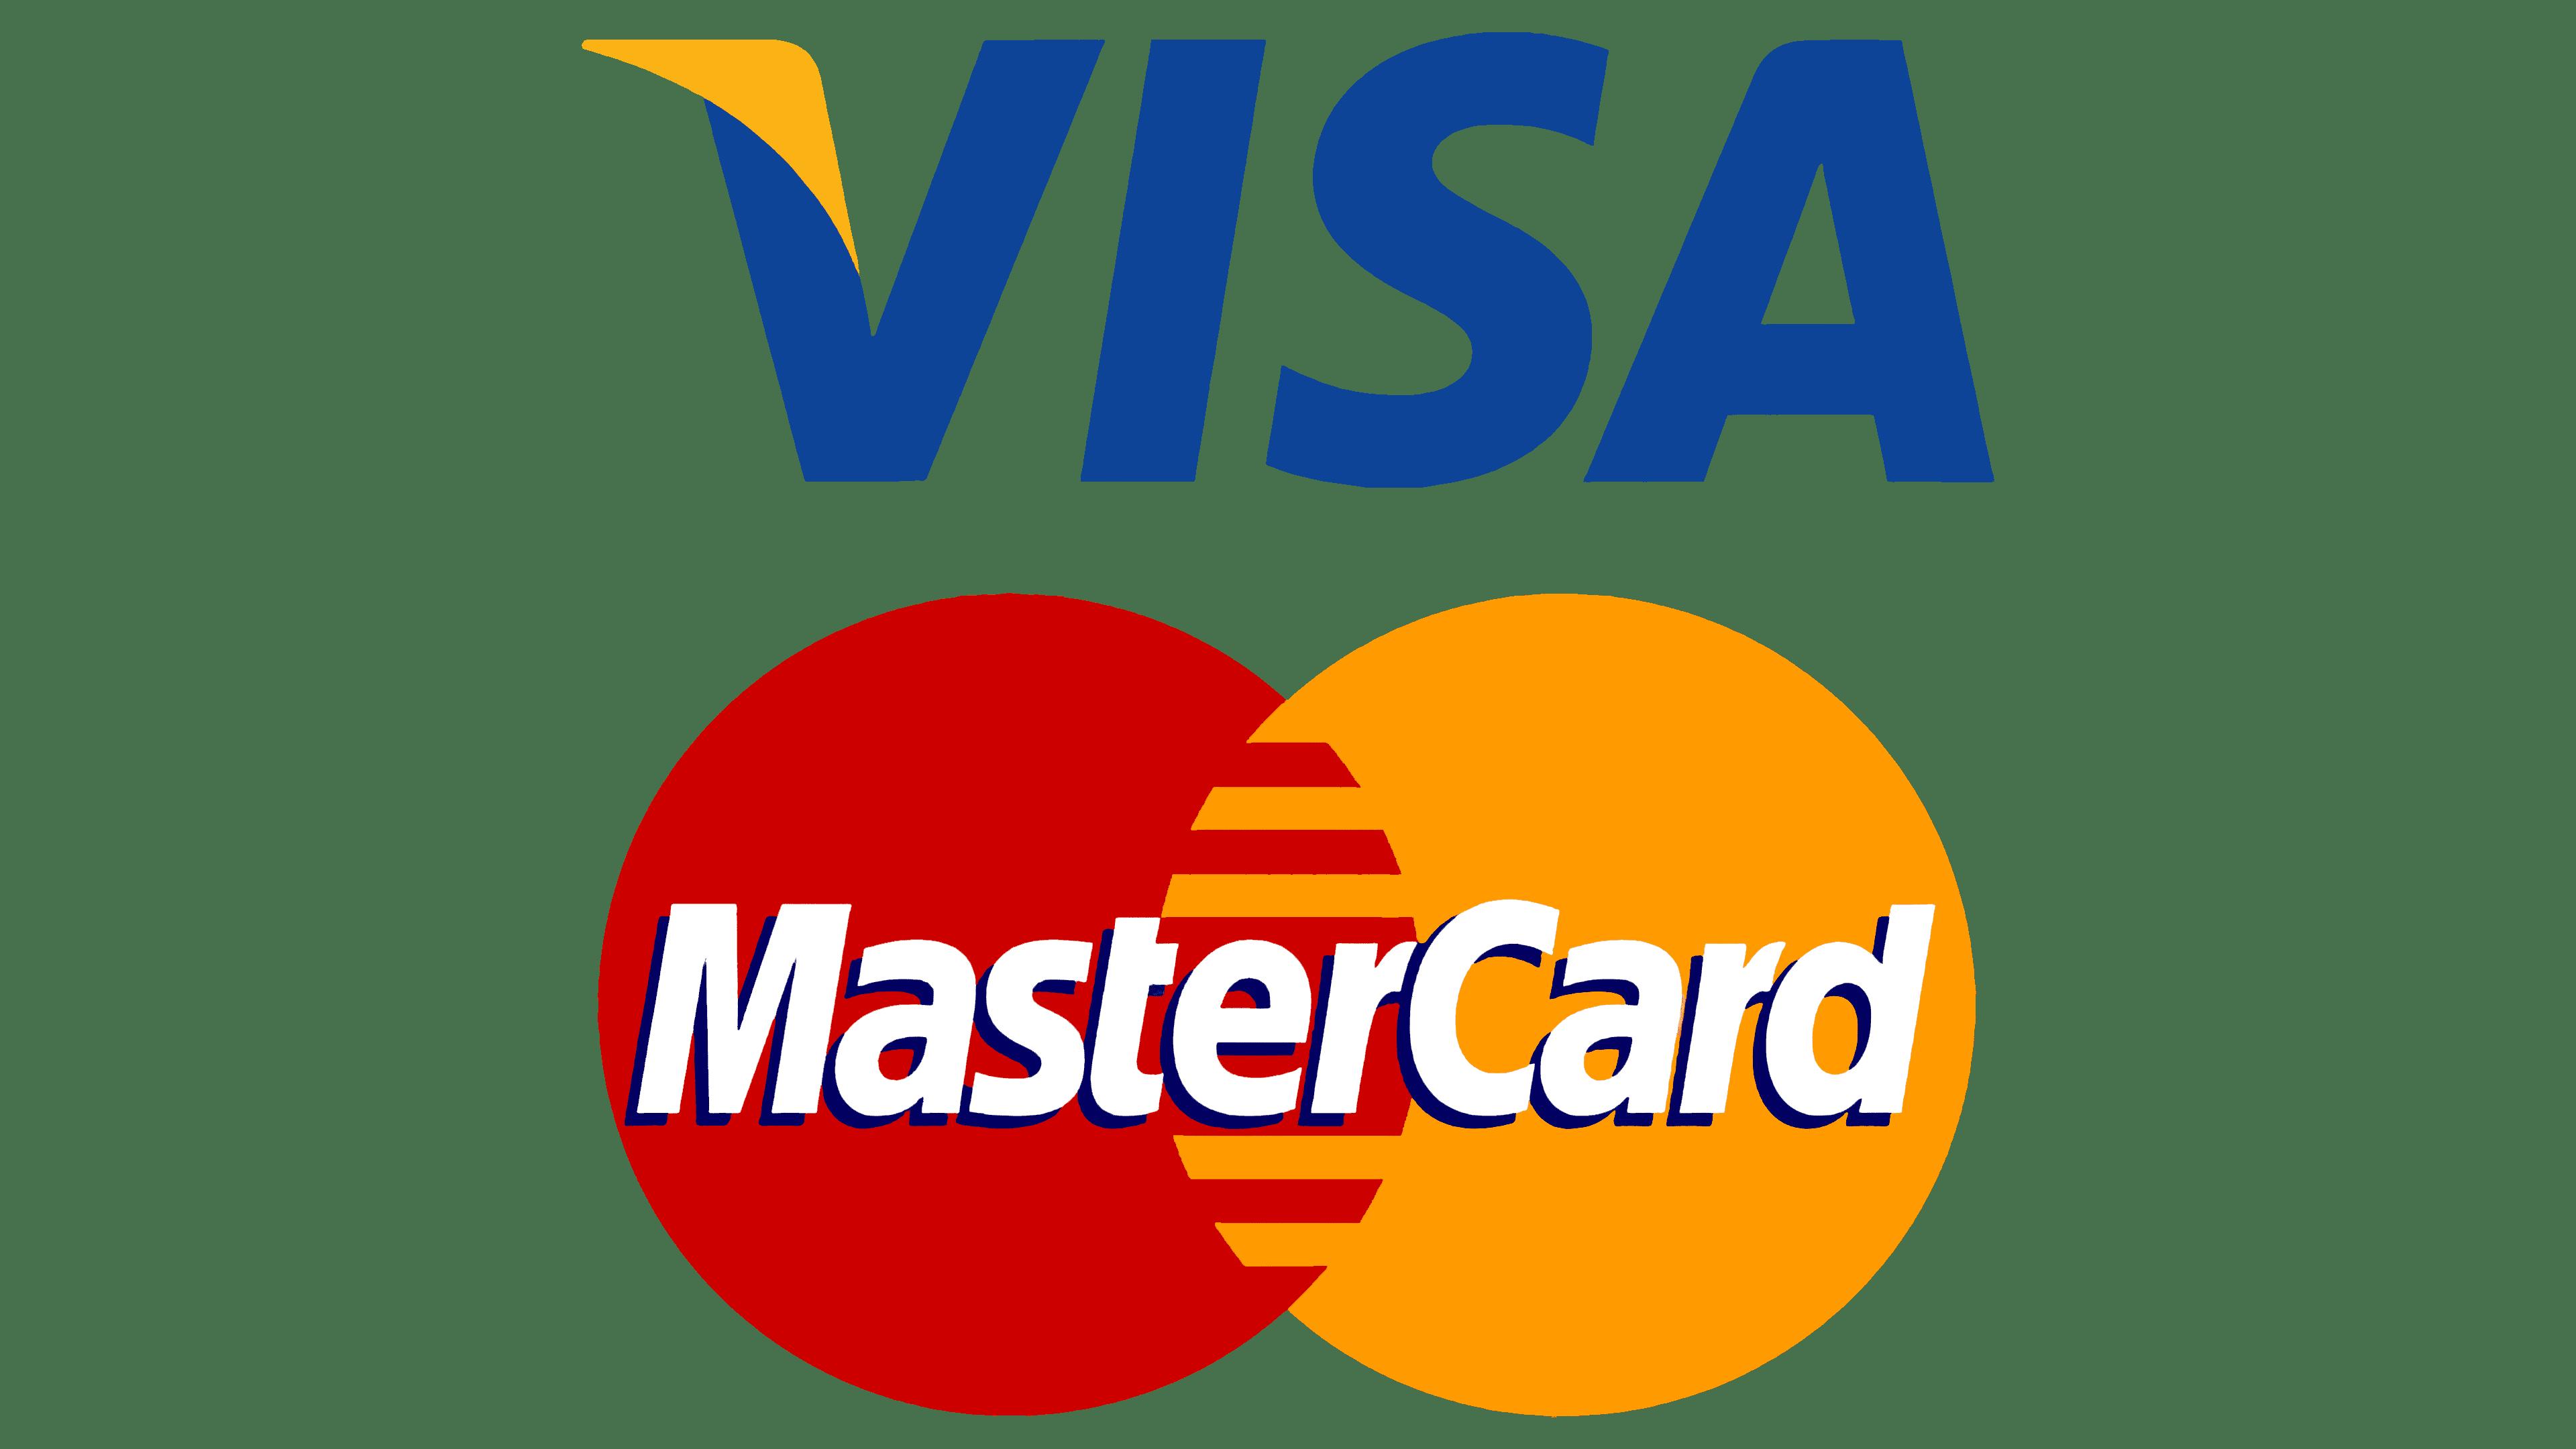 Visa-Simbolo.png